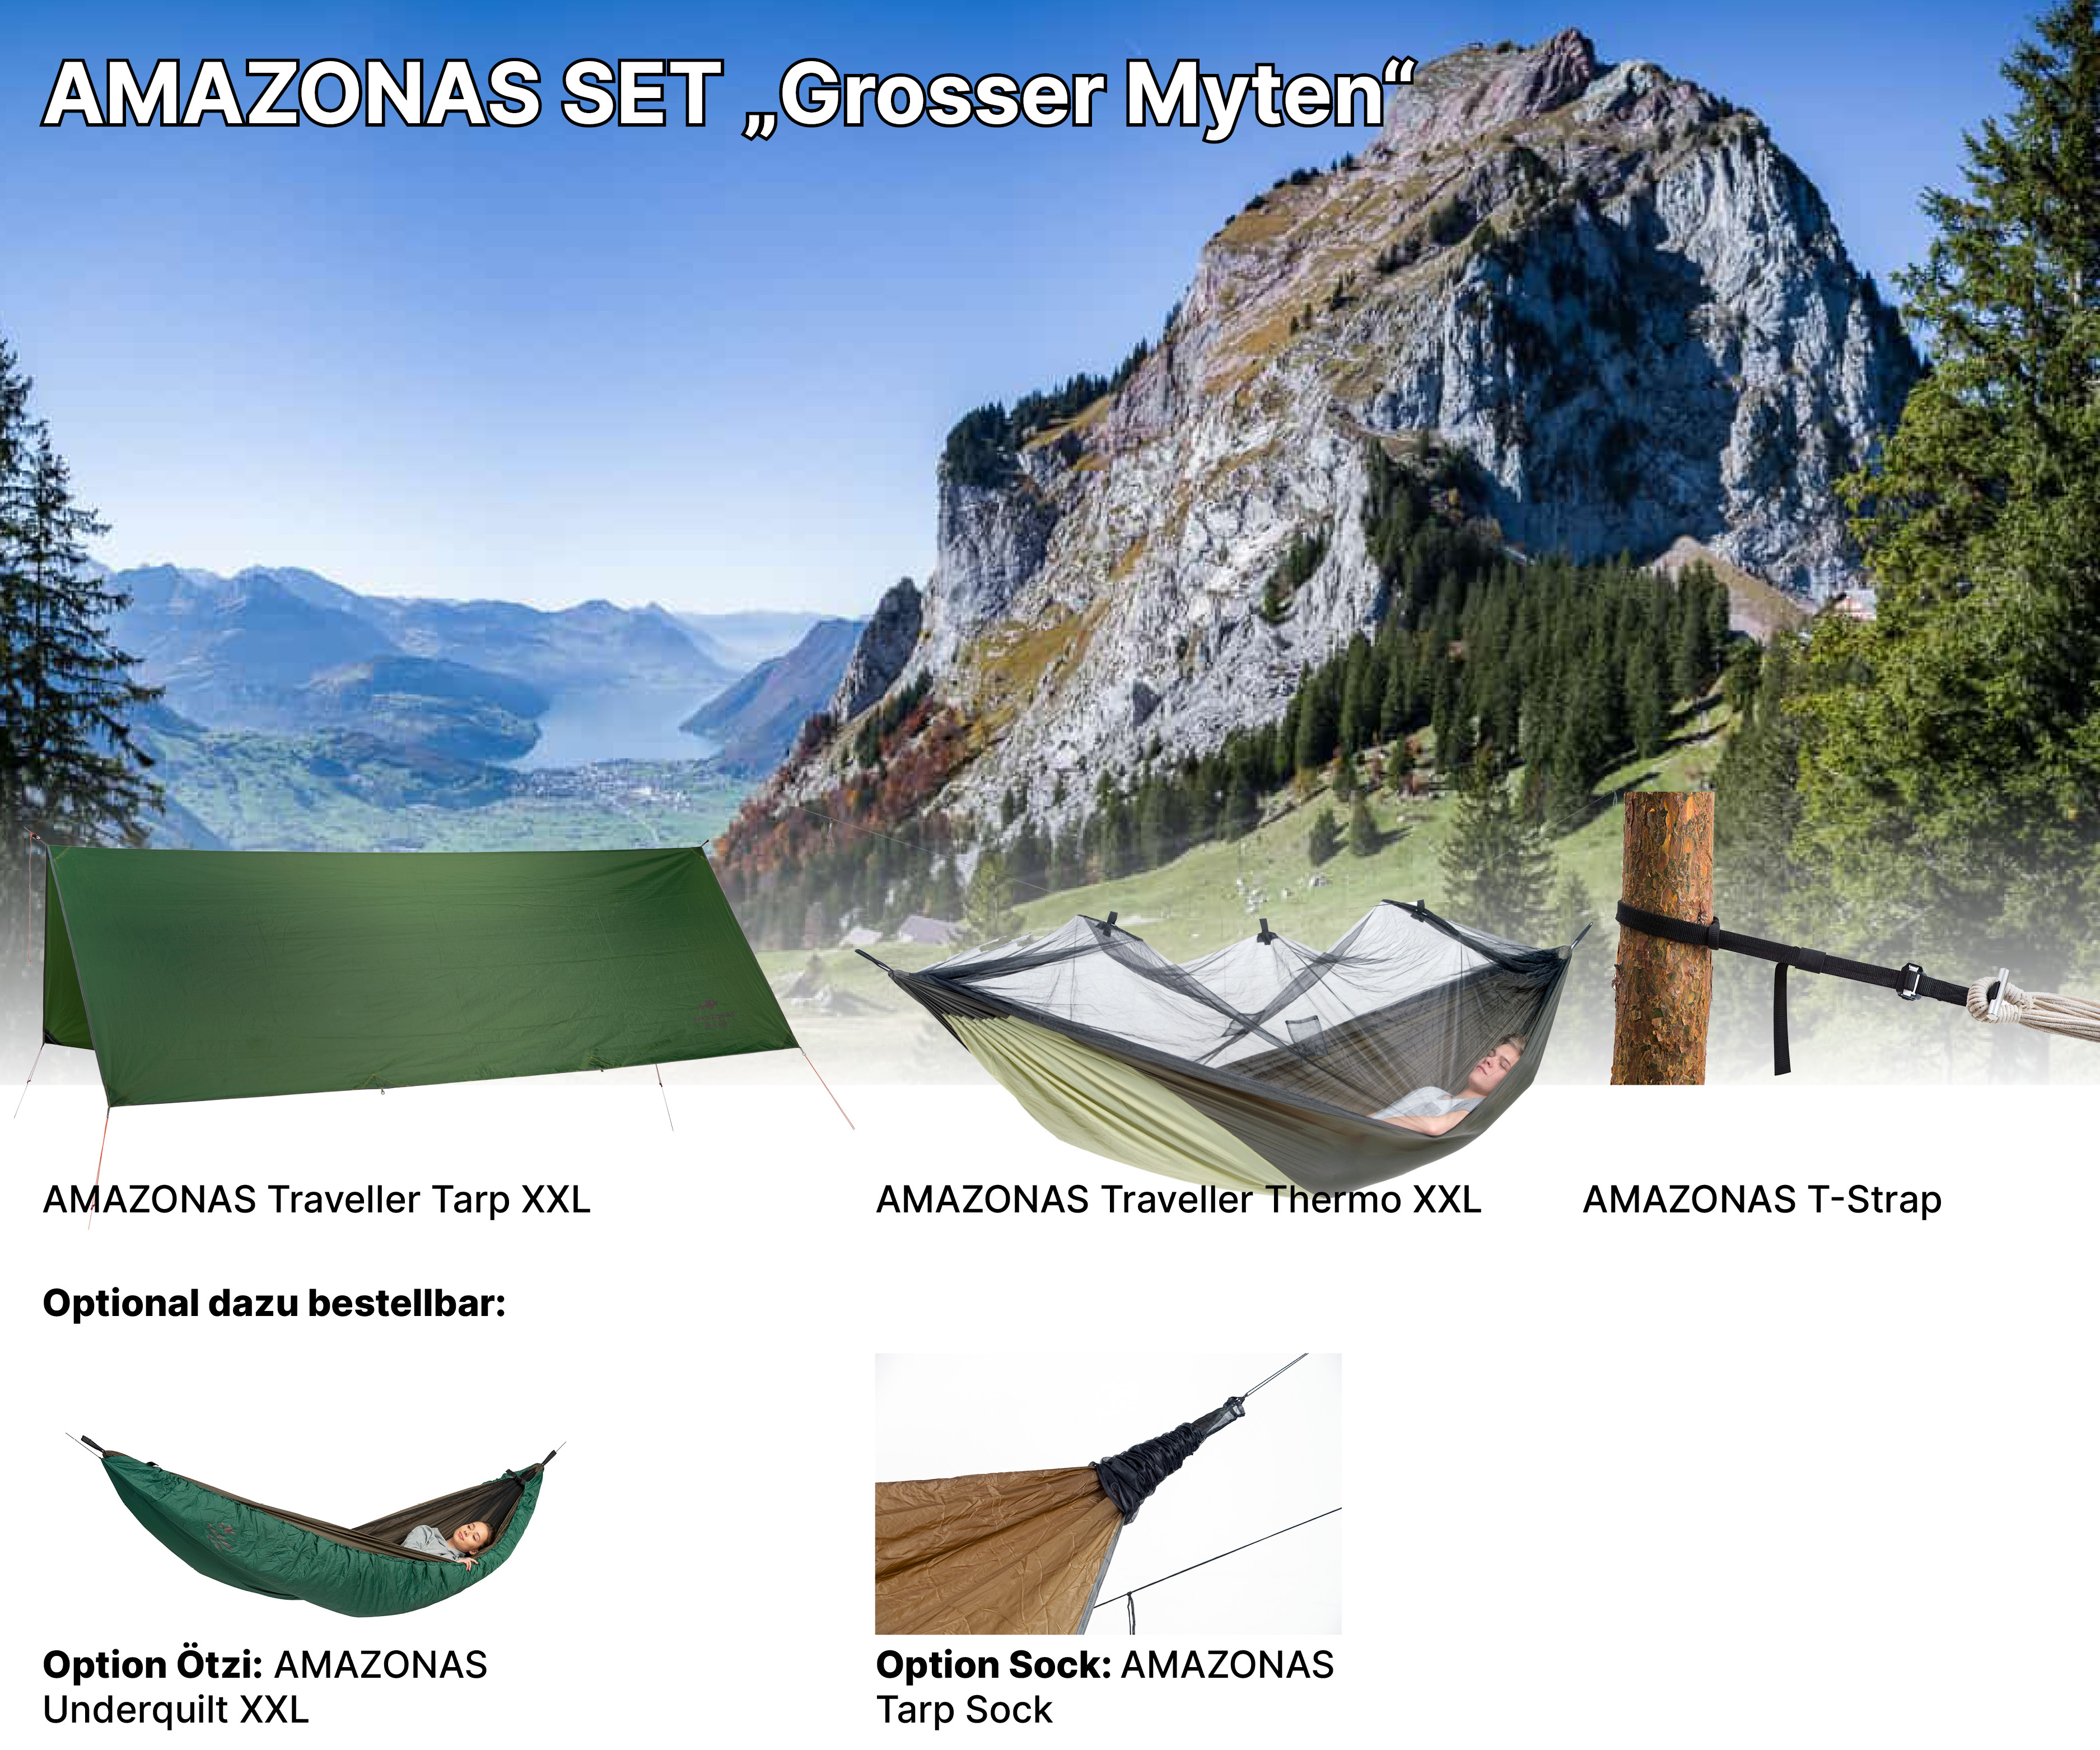 AMAZONAS Adventure Set Grosser Myte